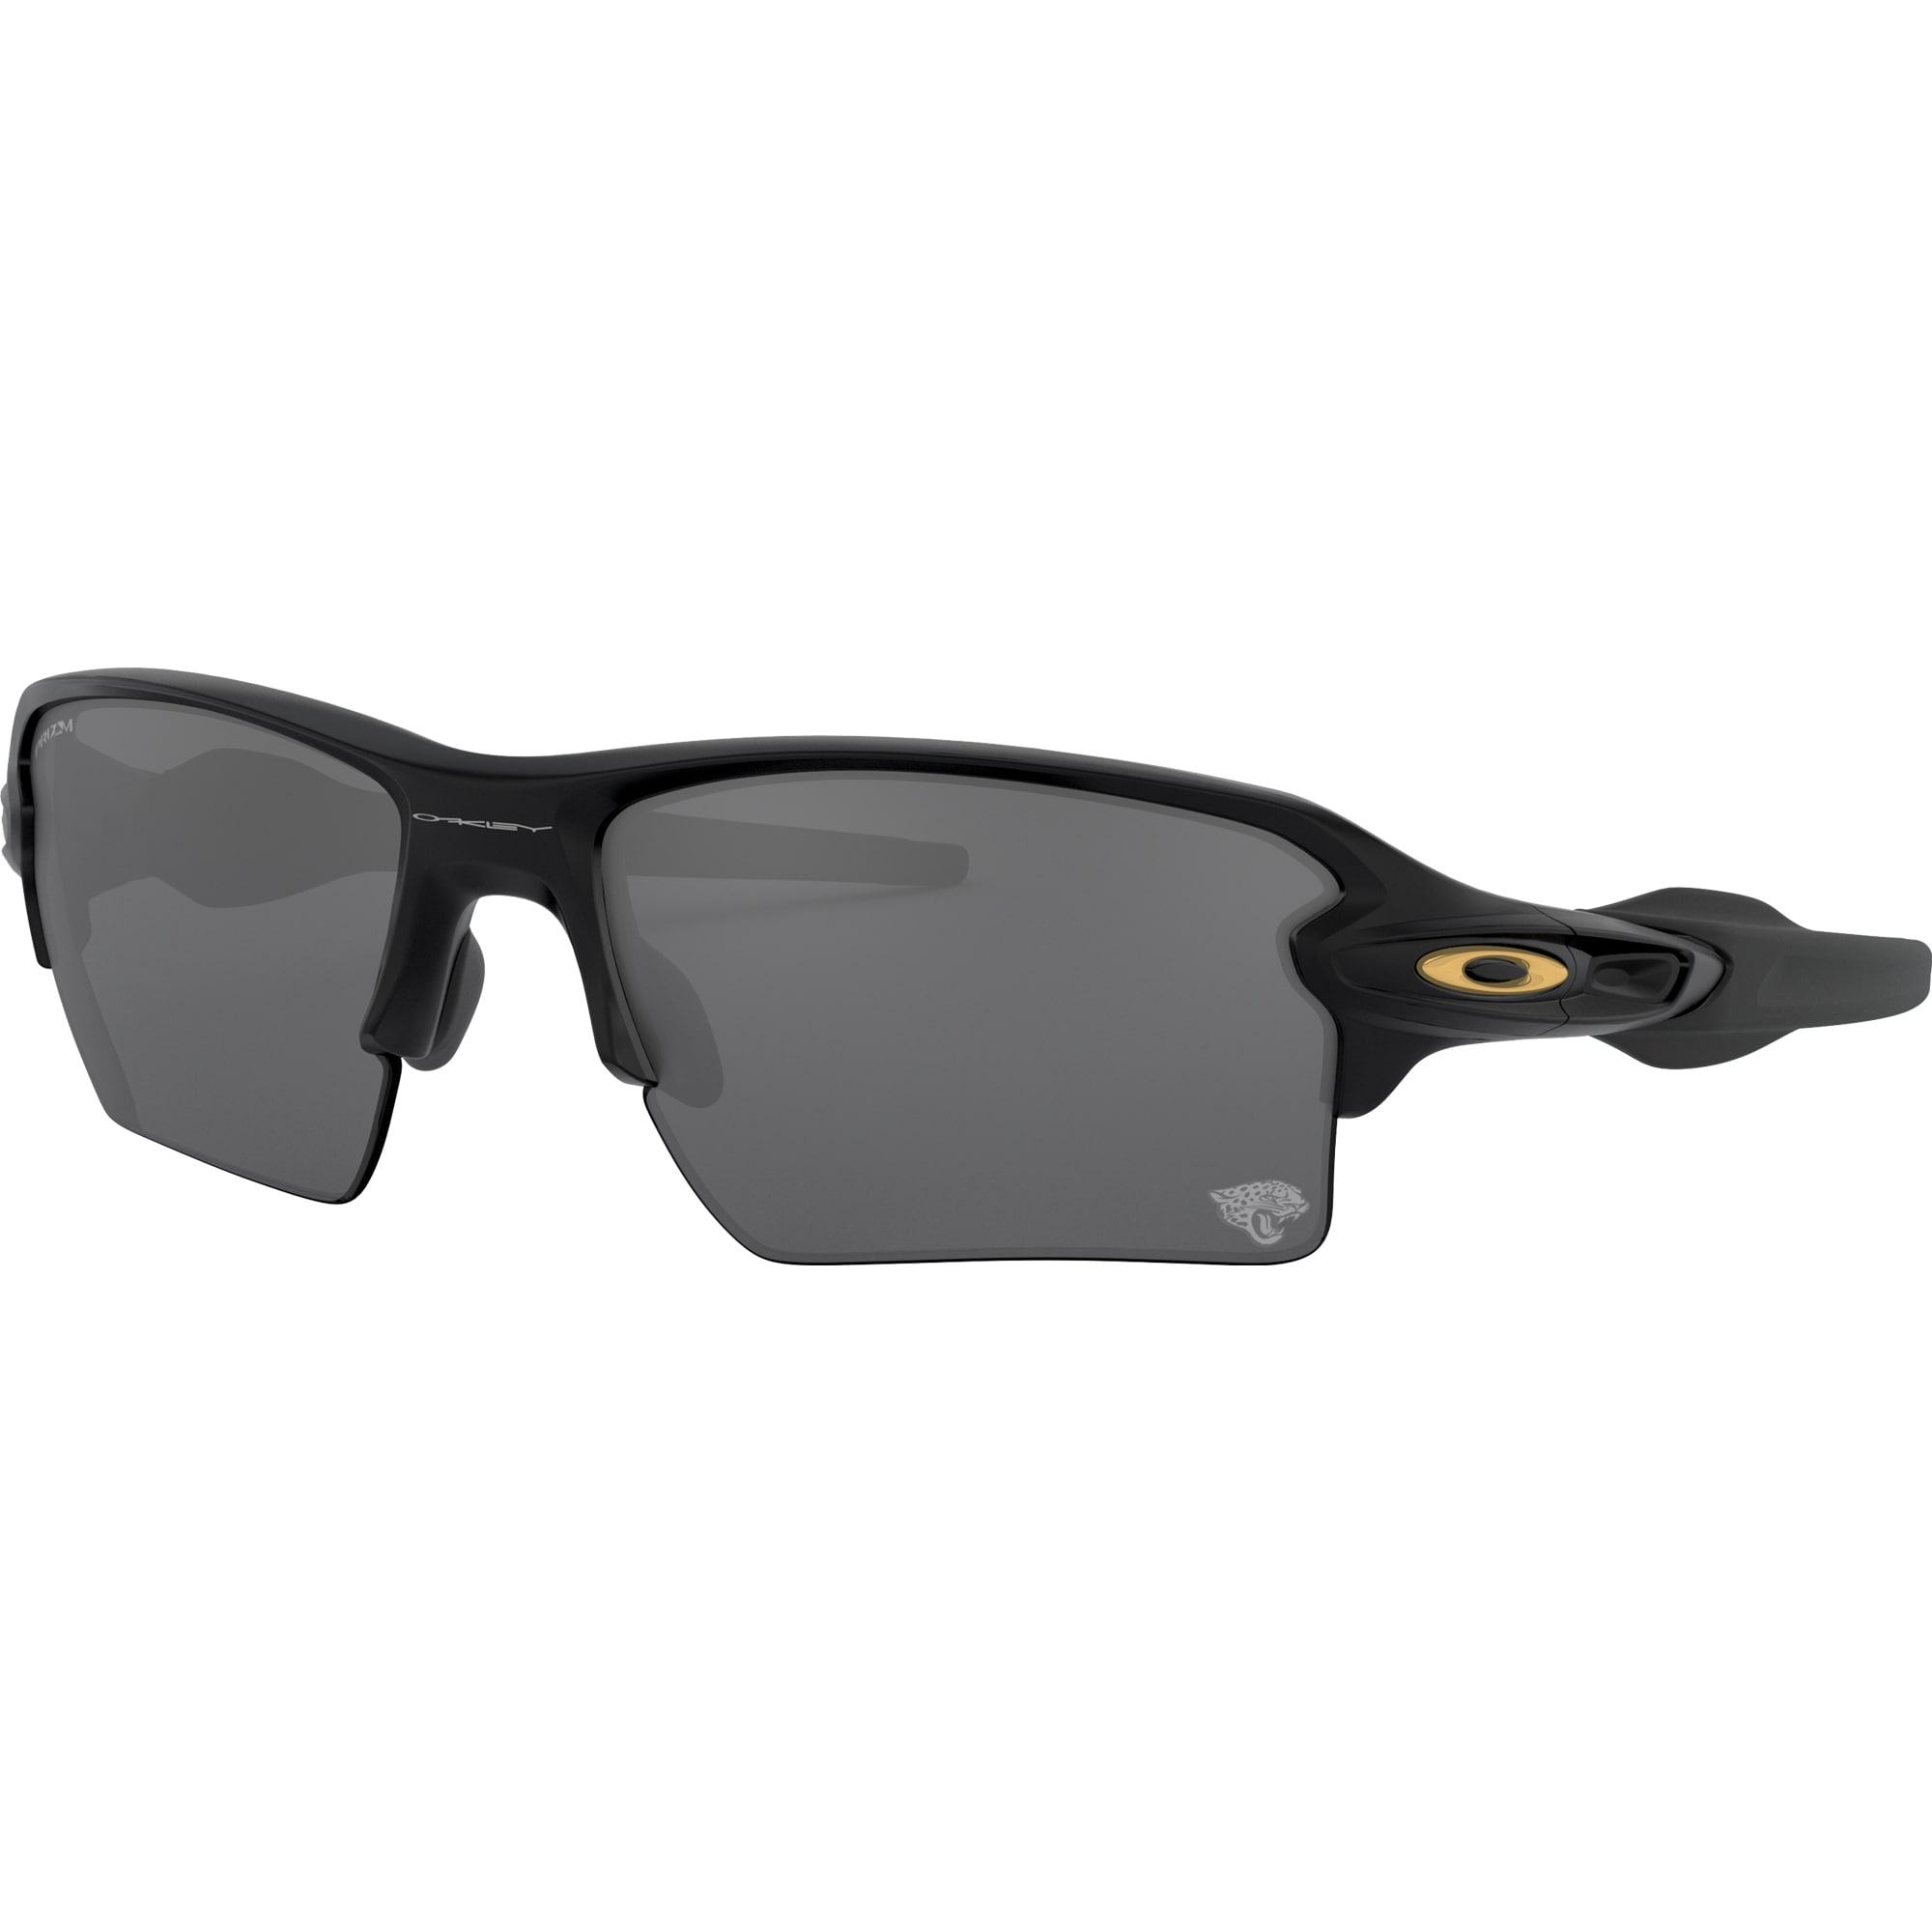 Jacksonville Jaguars Oakley Flak 2.0 XL Sunglasses